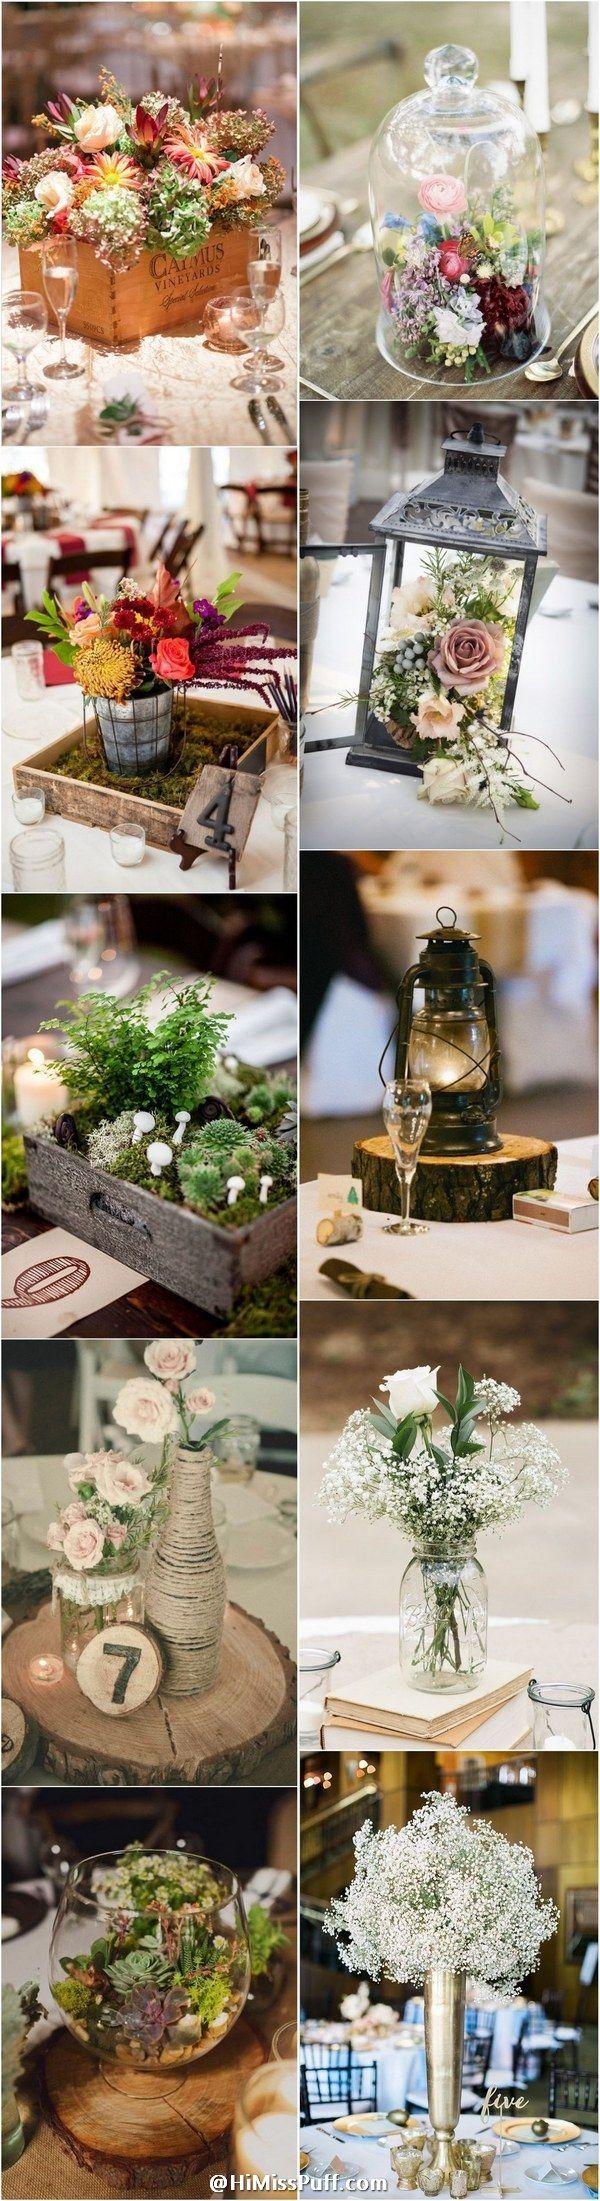 100 Country Rustic Wedding Centerpiece Ideas / http://www.himisspuff.com/rustic-wedding-centerpiece-ideas/